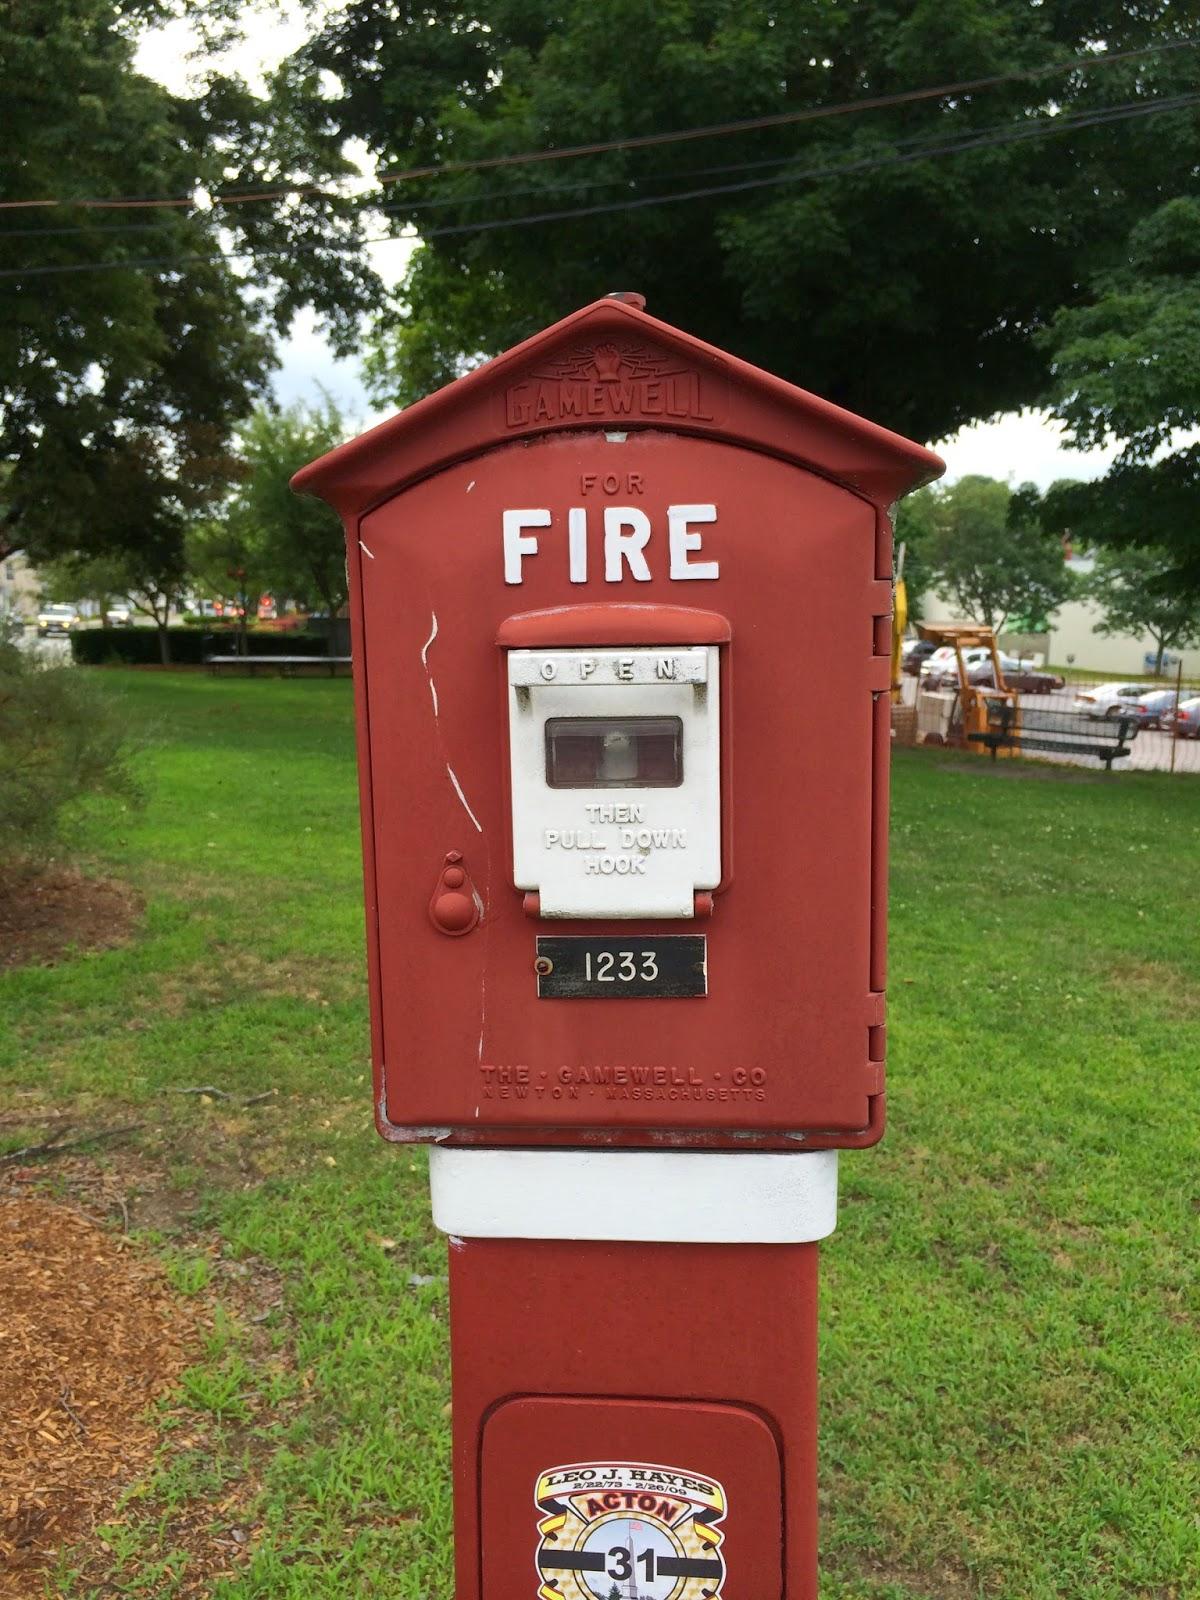 Maynard Life Outdoors And Hidden History Of Maynard Fire